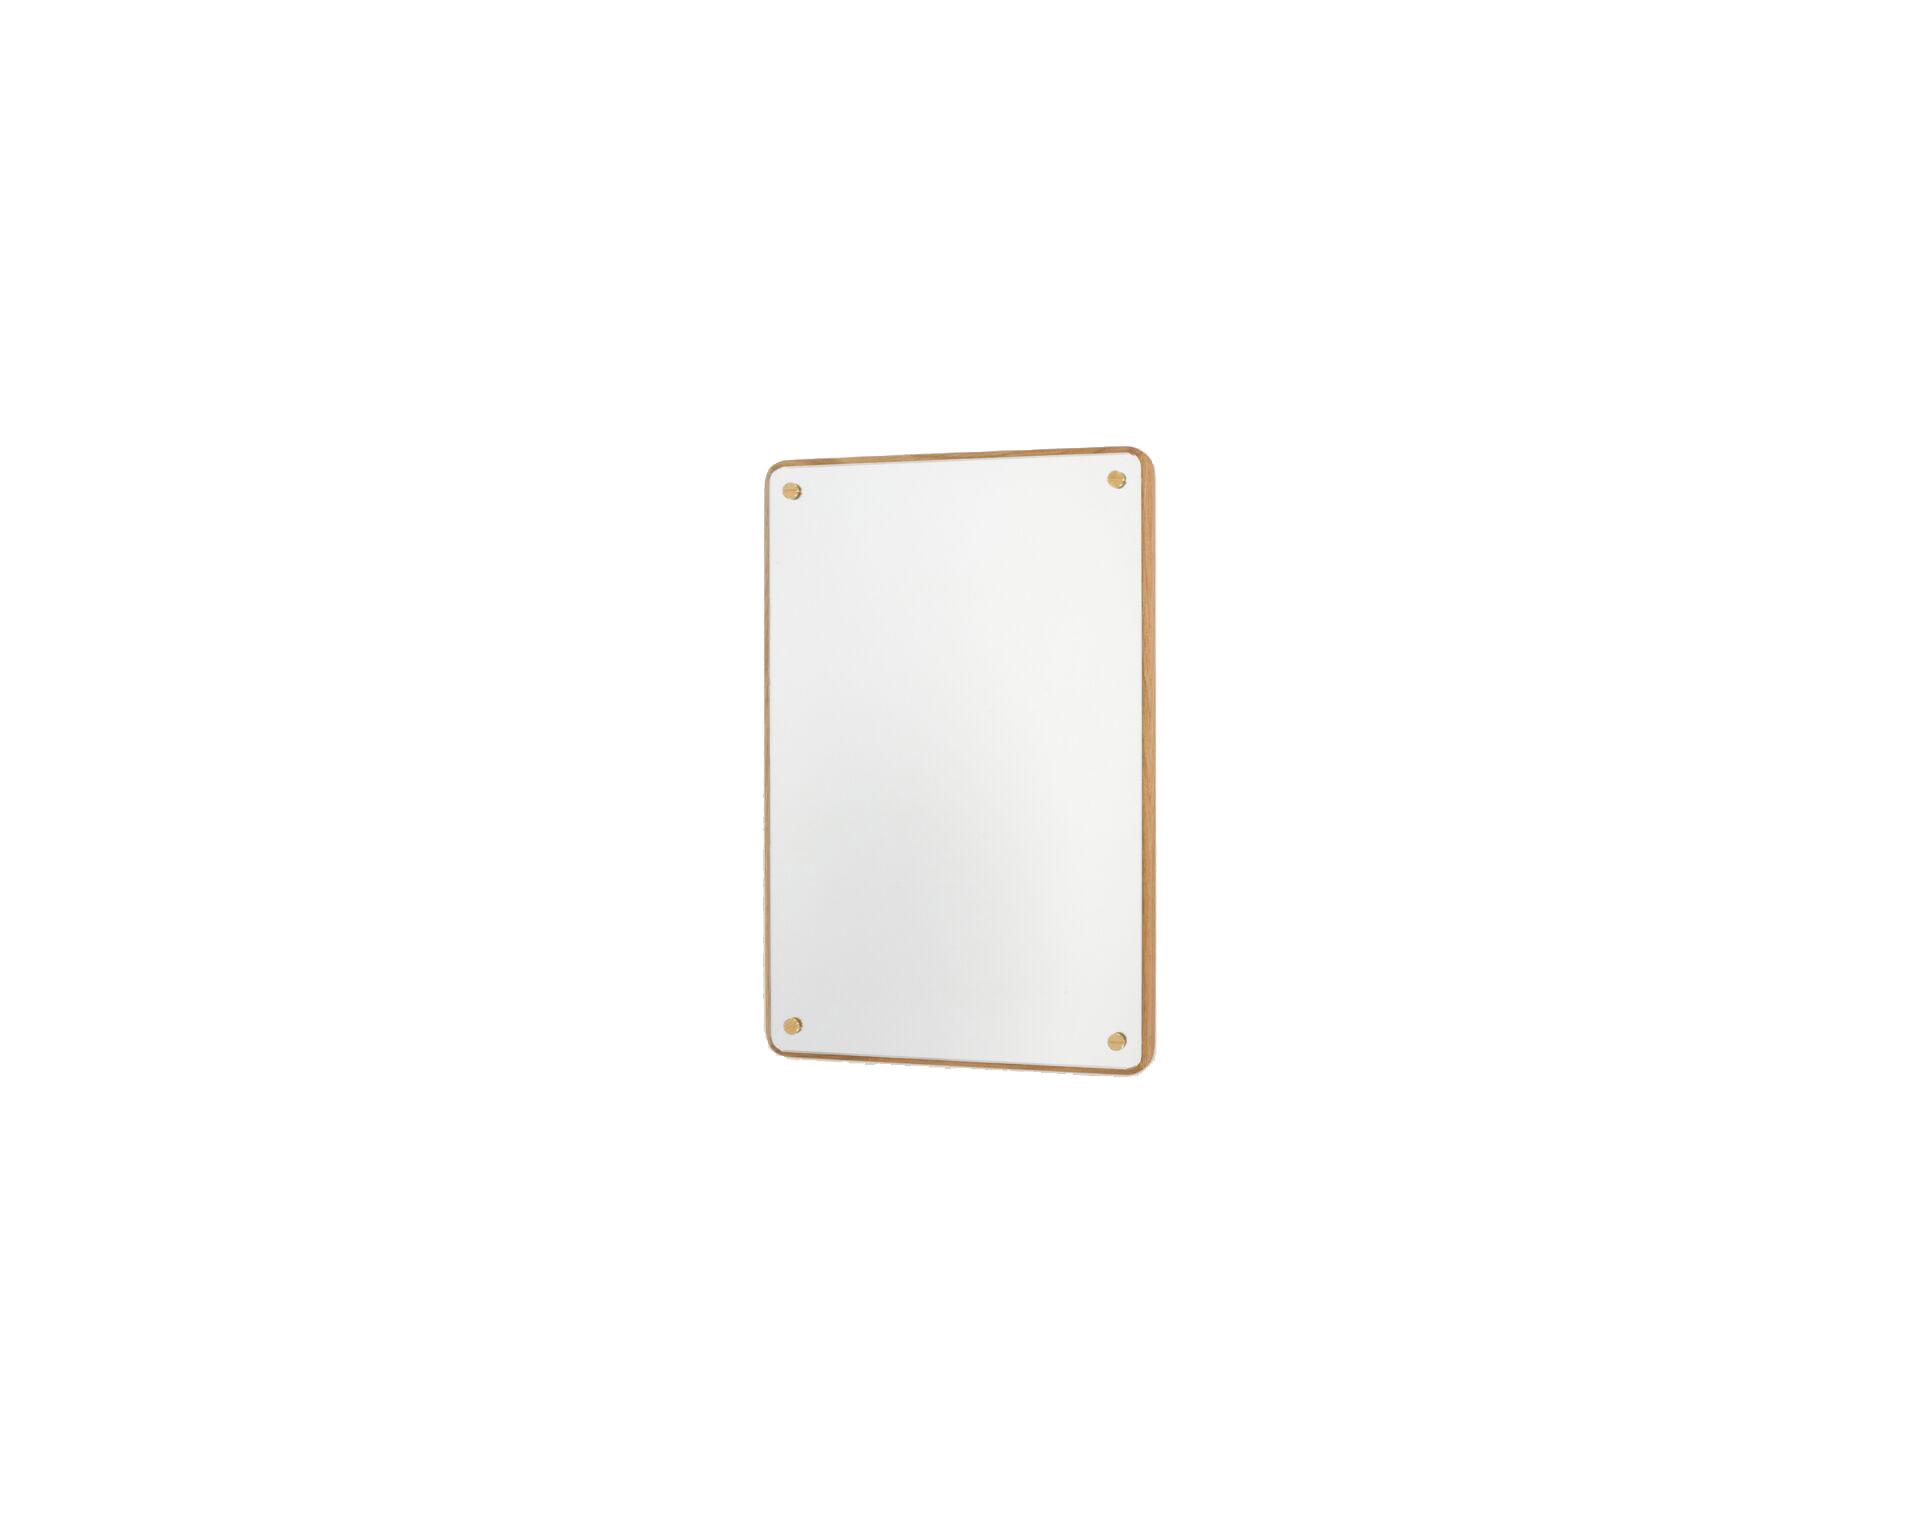 Frama RM-1 Mirror Small